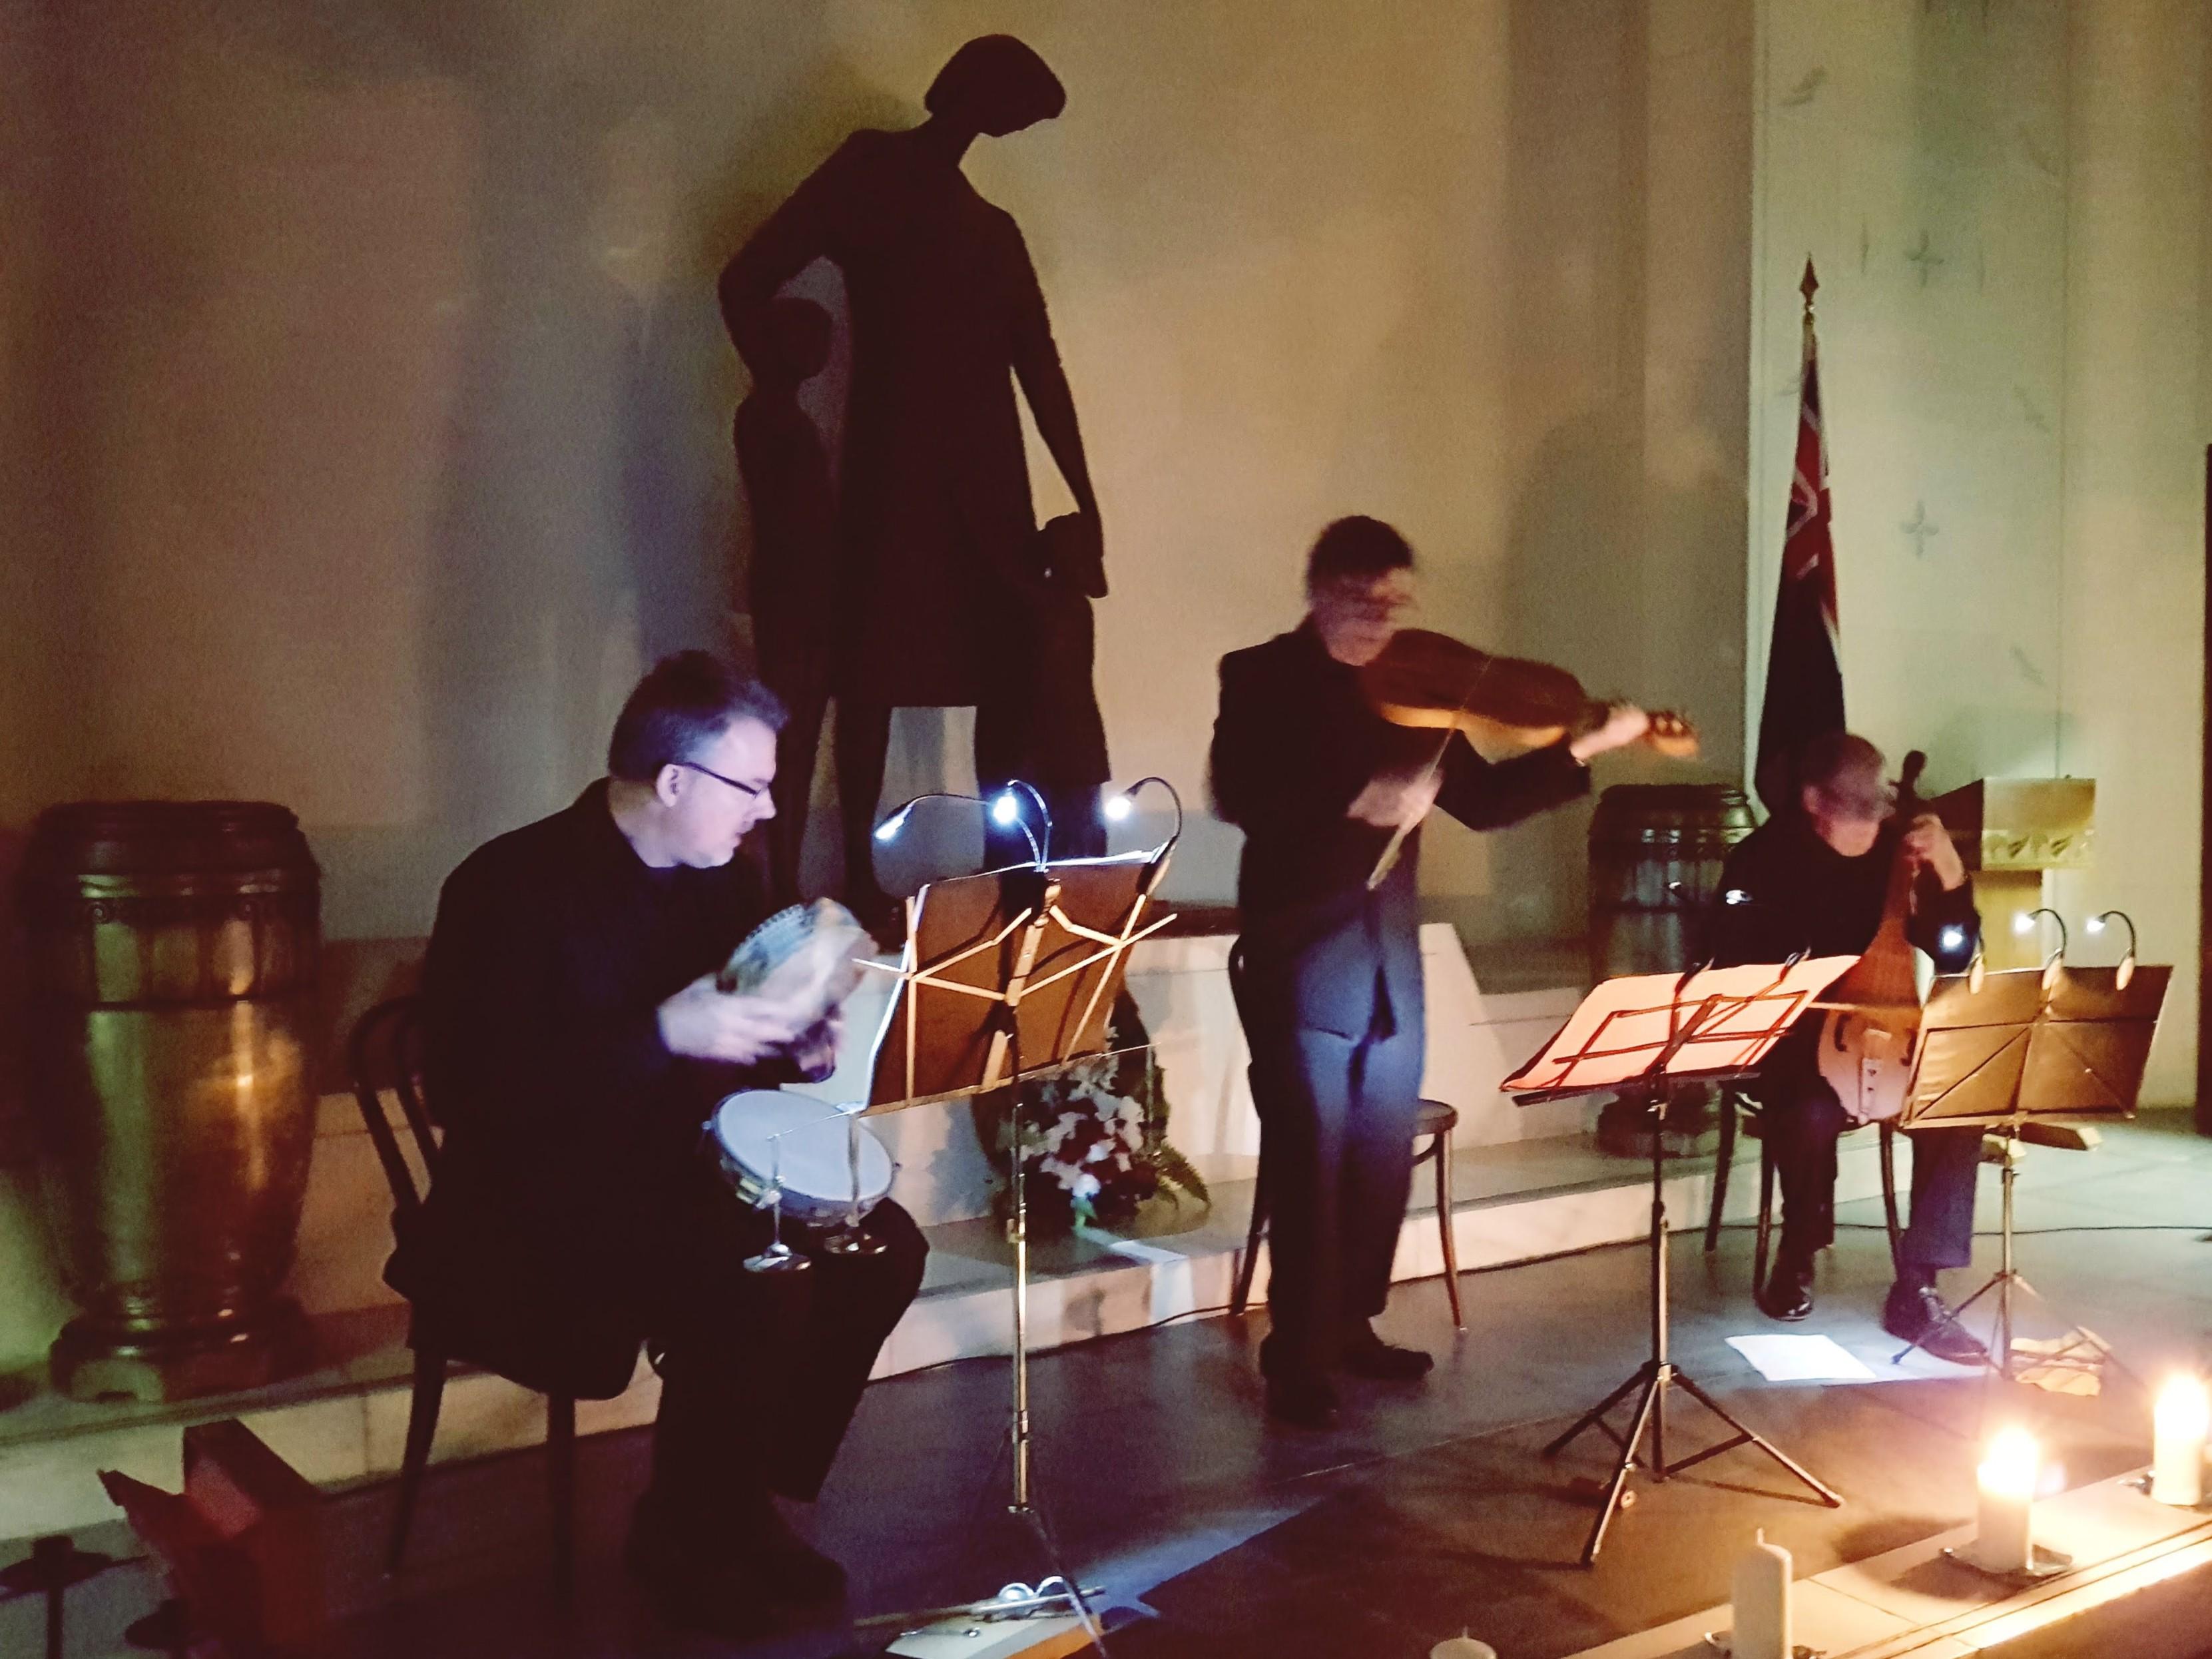 Medieval instrumentalists